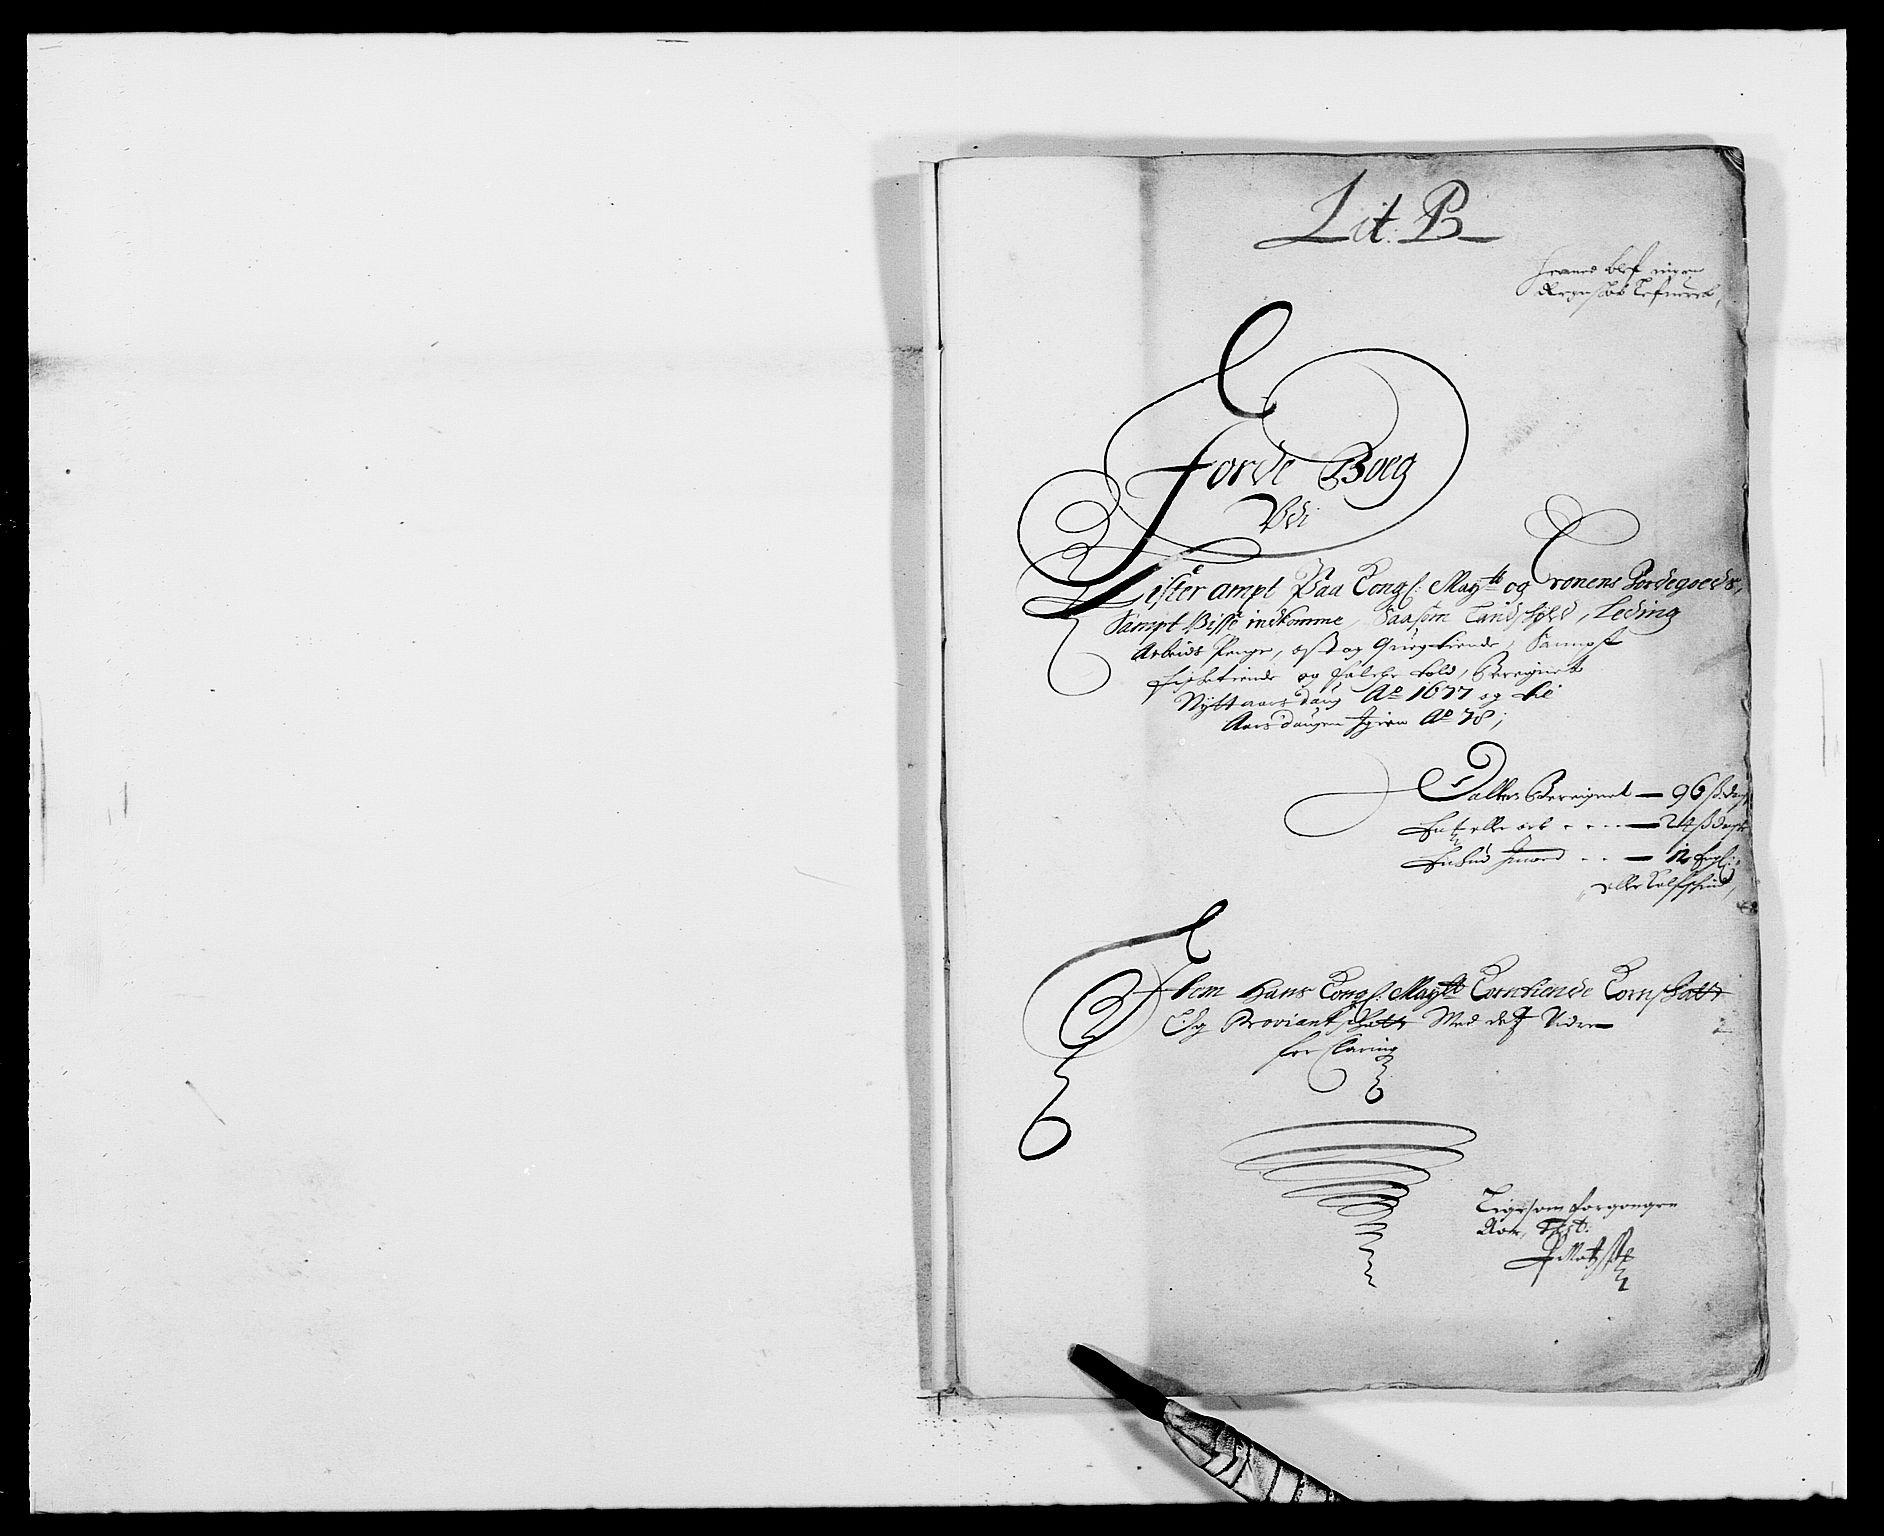 RA, Rentekammeret inntil 1814, Reviderte regnskaper, Fogderegnskap, R41/L2530: Fogderegnskap Lista, 1677-1679, s. 1